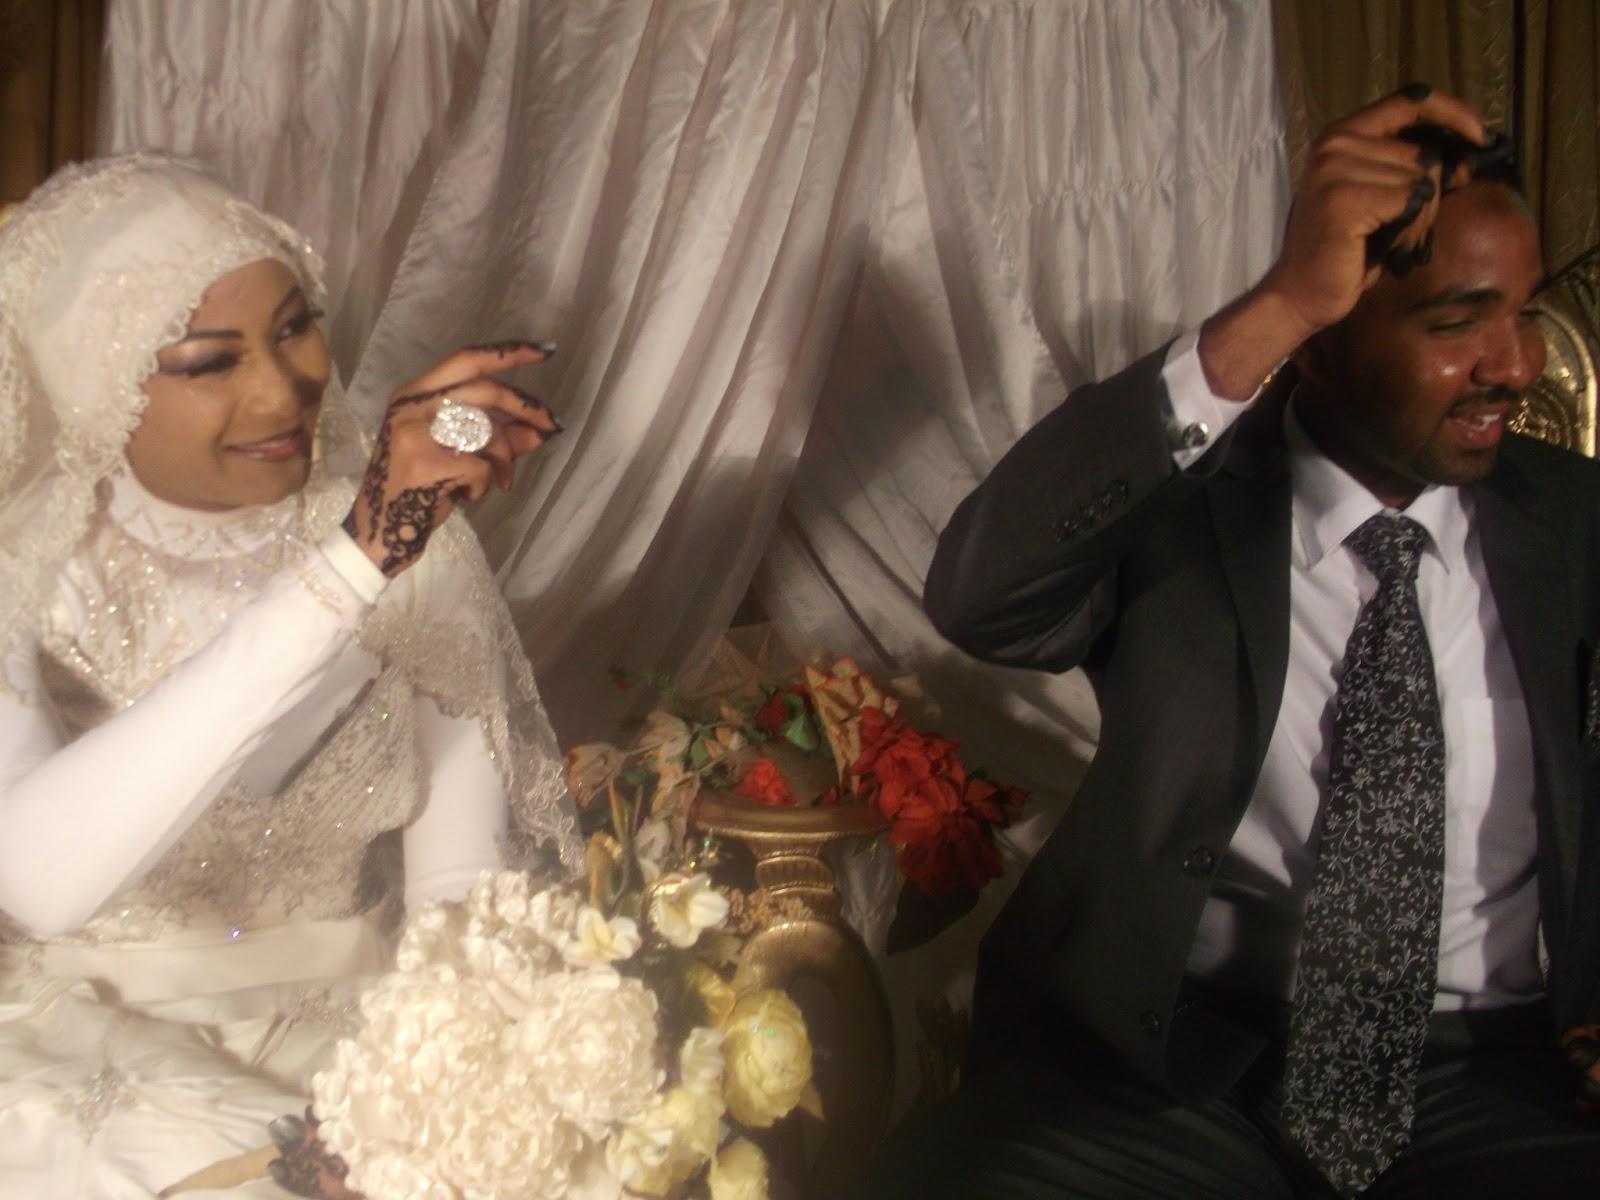 muslim single men in sudan Muslim reverts seeking marriage muslimfacescom  particularly with muslim women, if single or separated are finding that utilizing muslim marriage website to be .